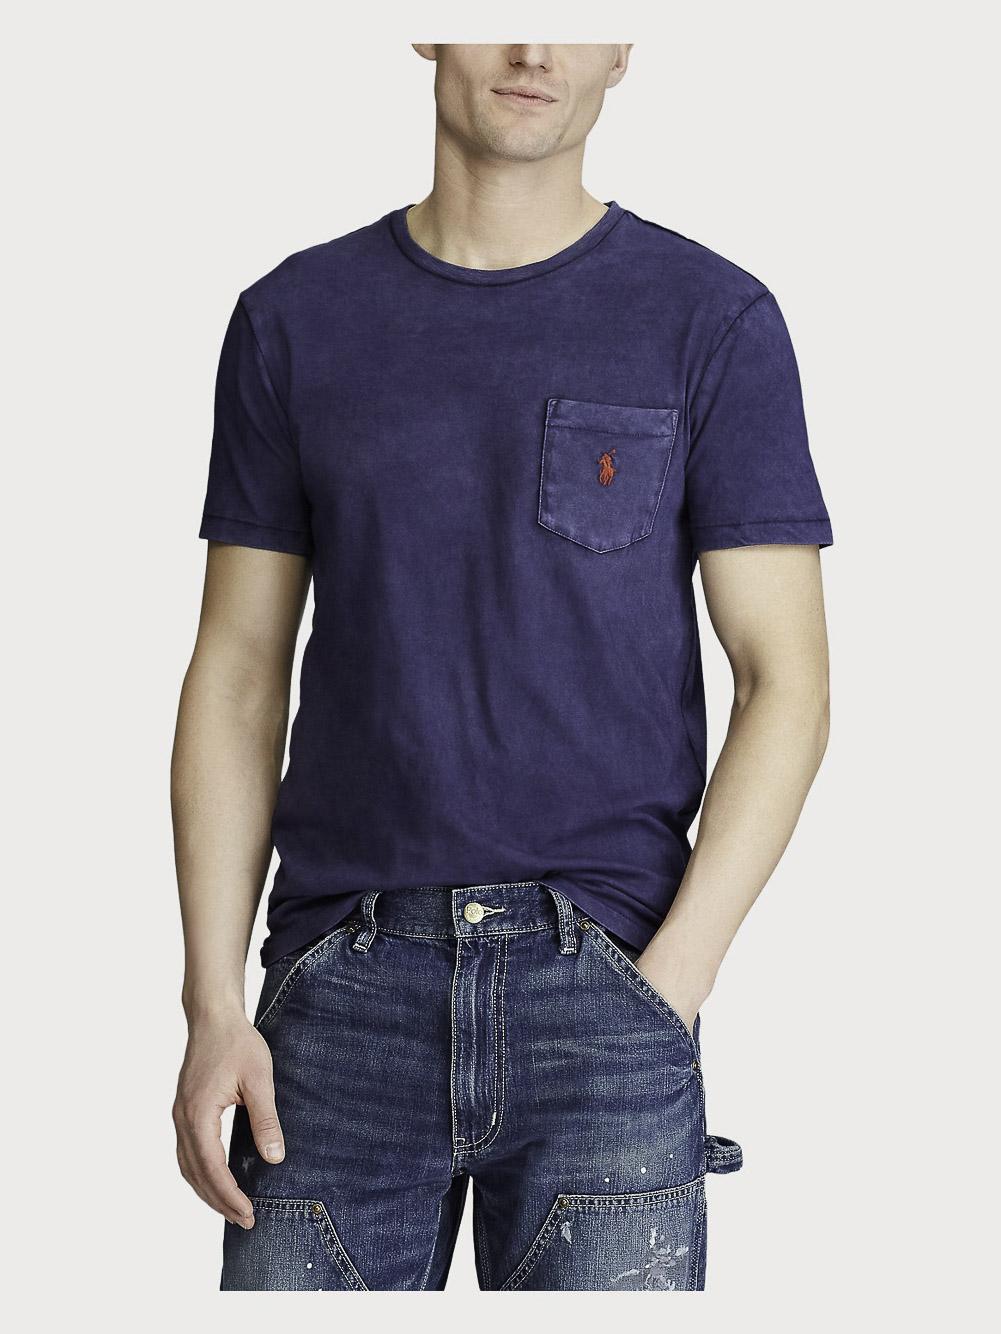 POLO RALPH LAUREN Μπλούζα T-Shirt 710795137003 ΜΠΛΕ